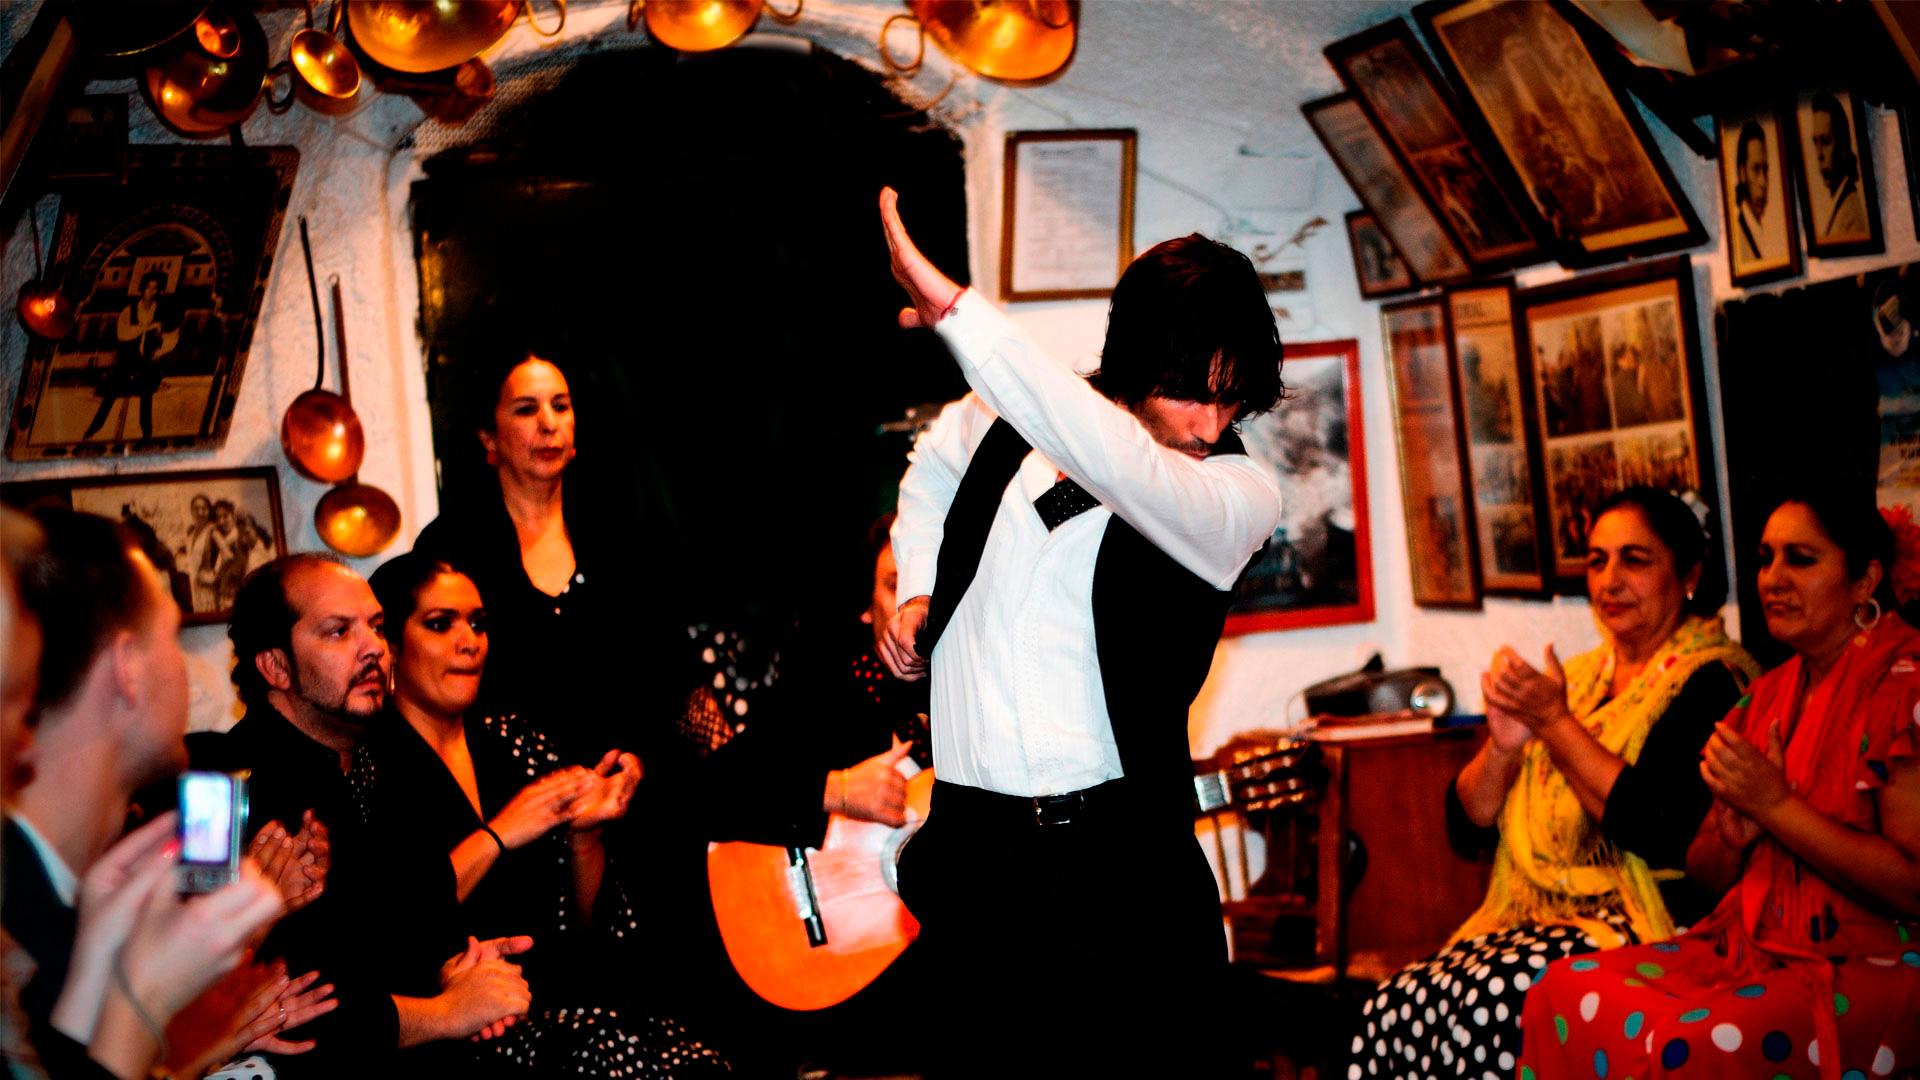 bailar-sacromonte-flamenco